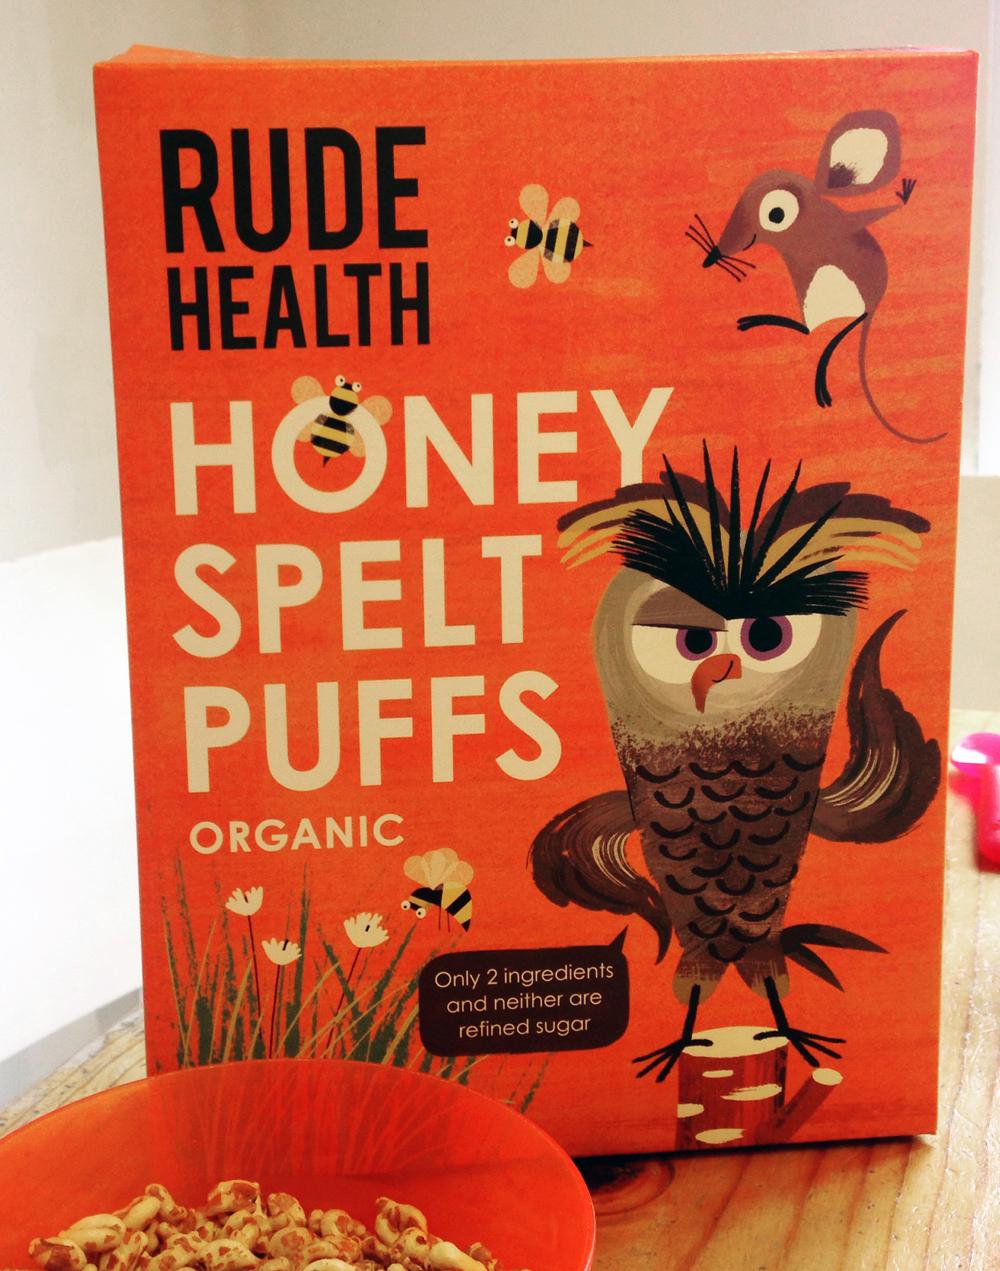 Rude-Health-Honey-Spelt-Puffs-Sneaky-Veg-Review